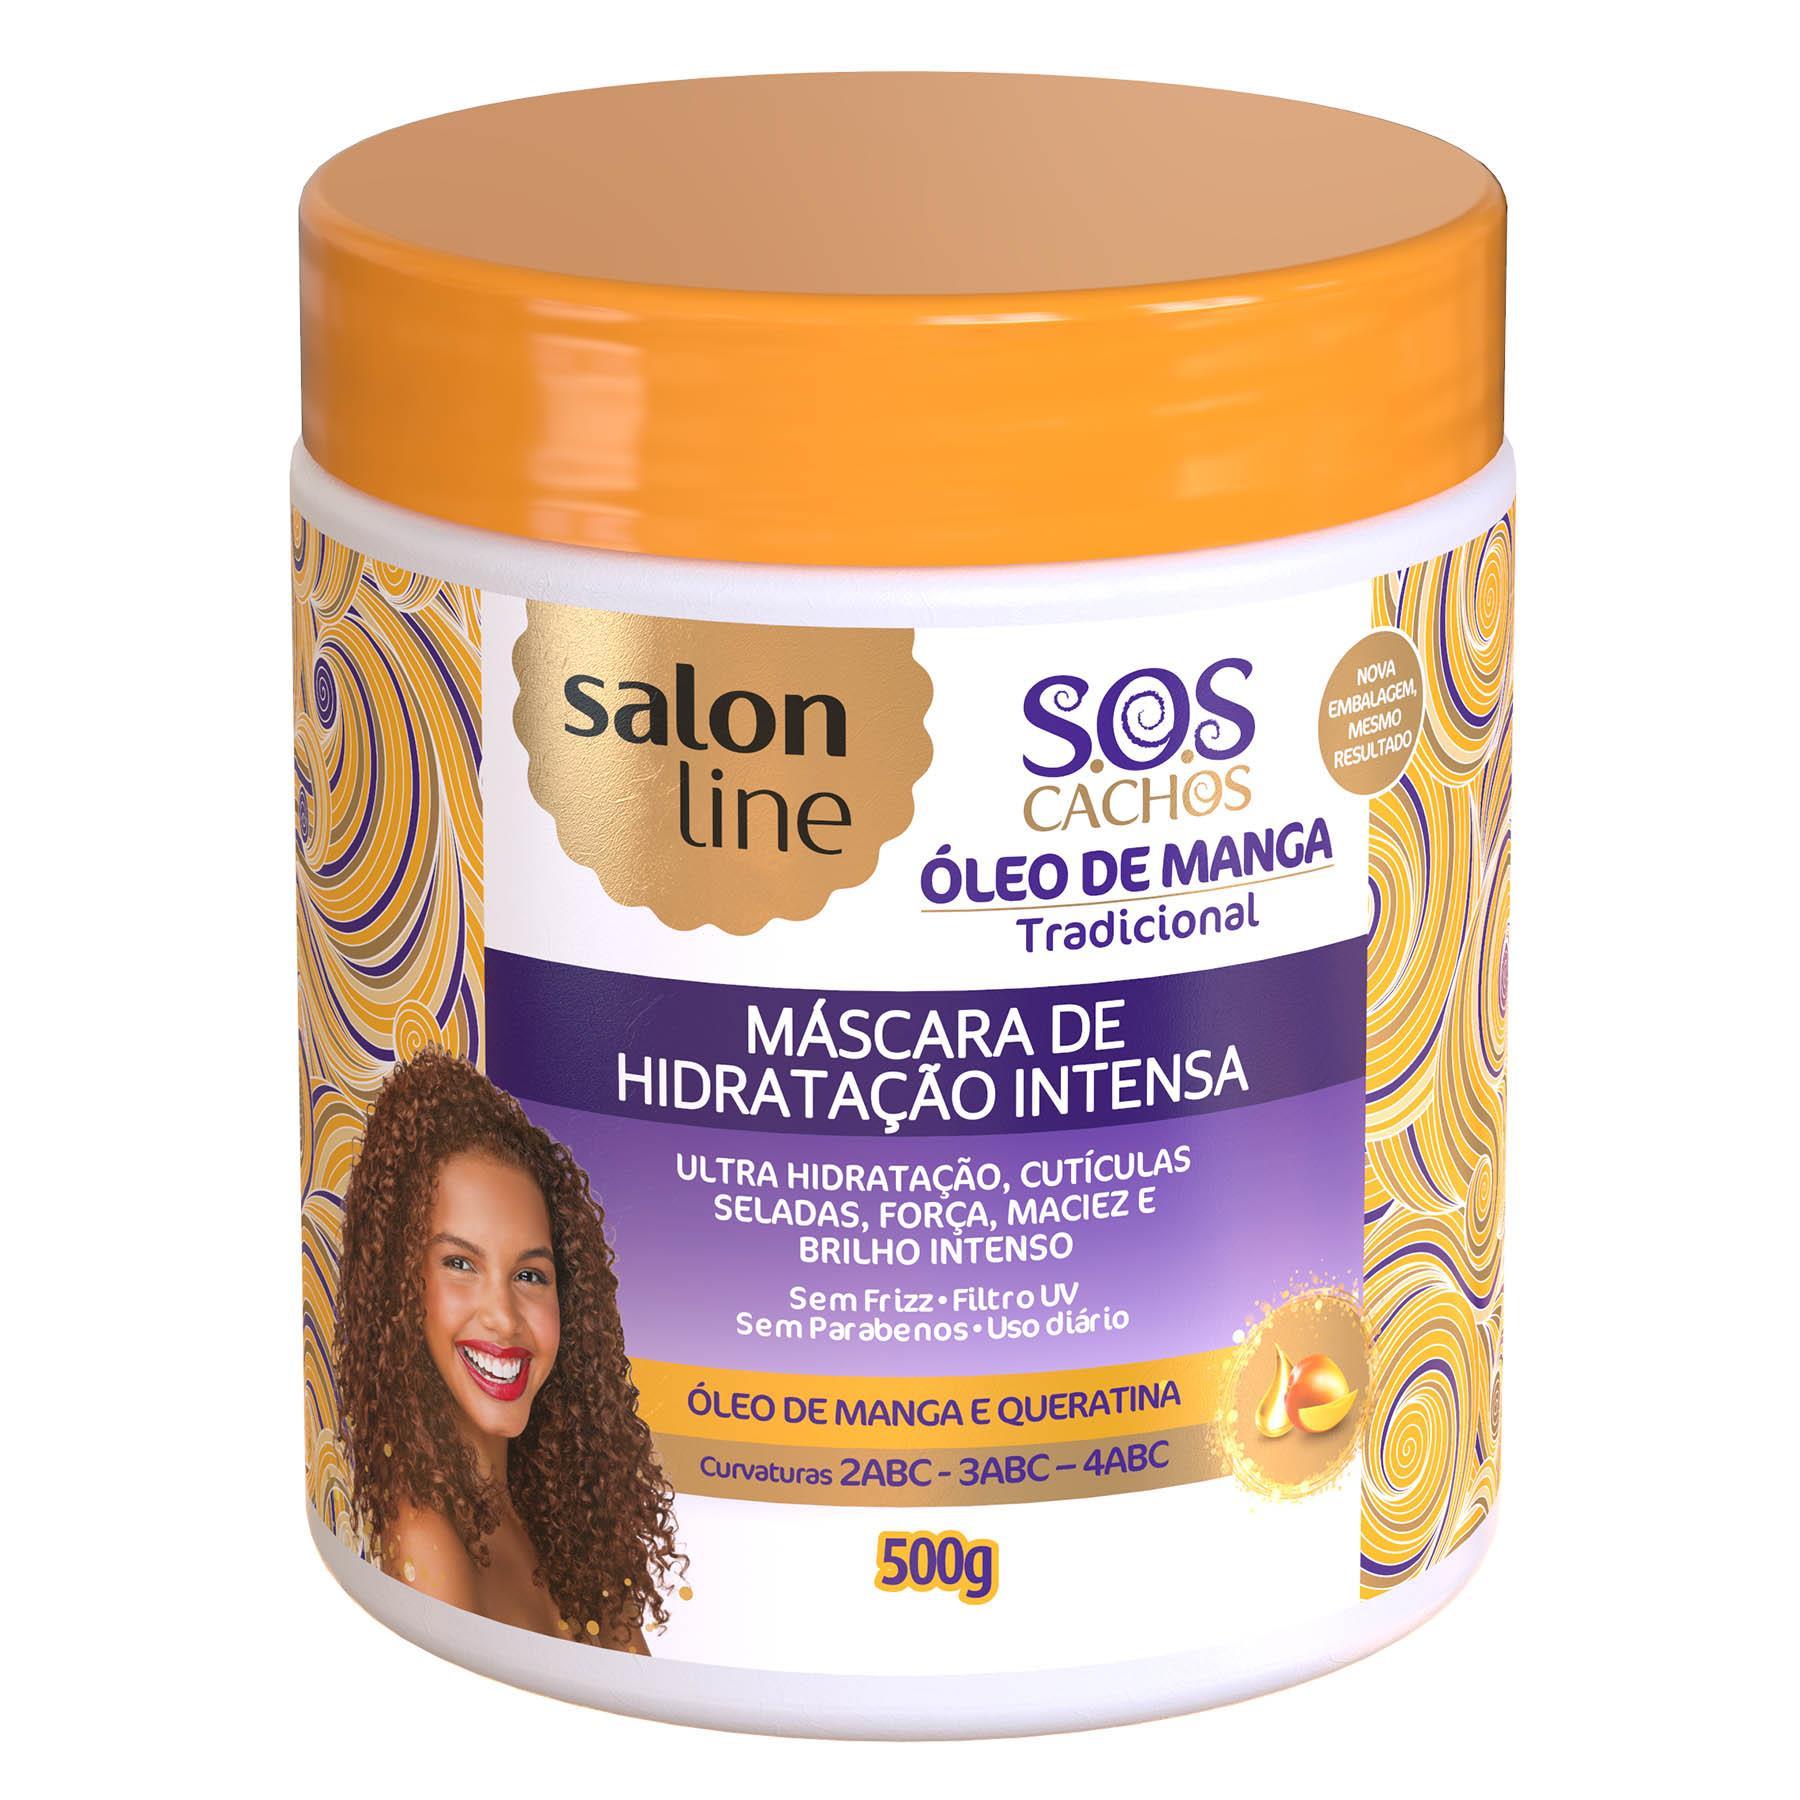 c580f89f4 Máscara Hidratação Intensa 500gr - S.O.S Cachos - Loja Salon Line